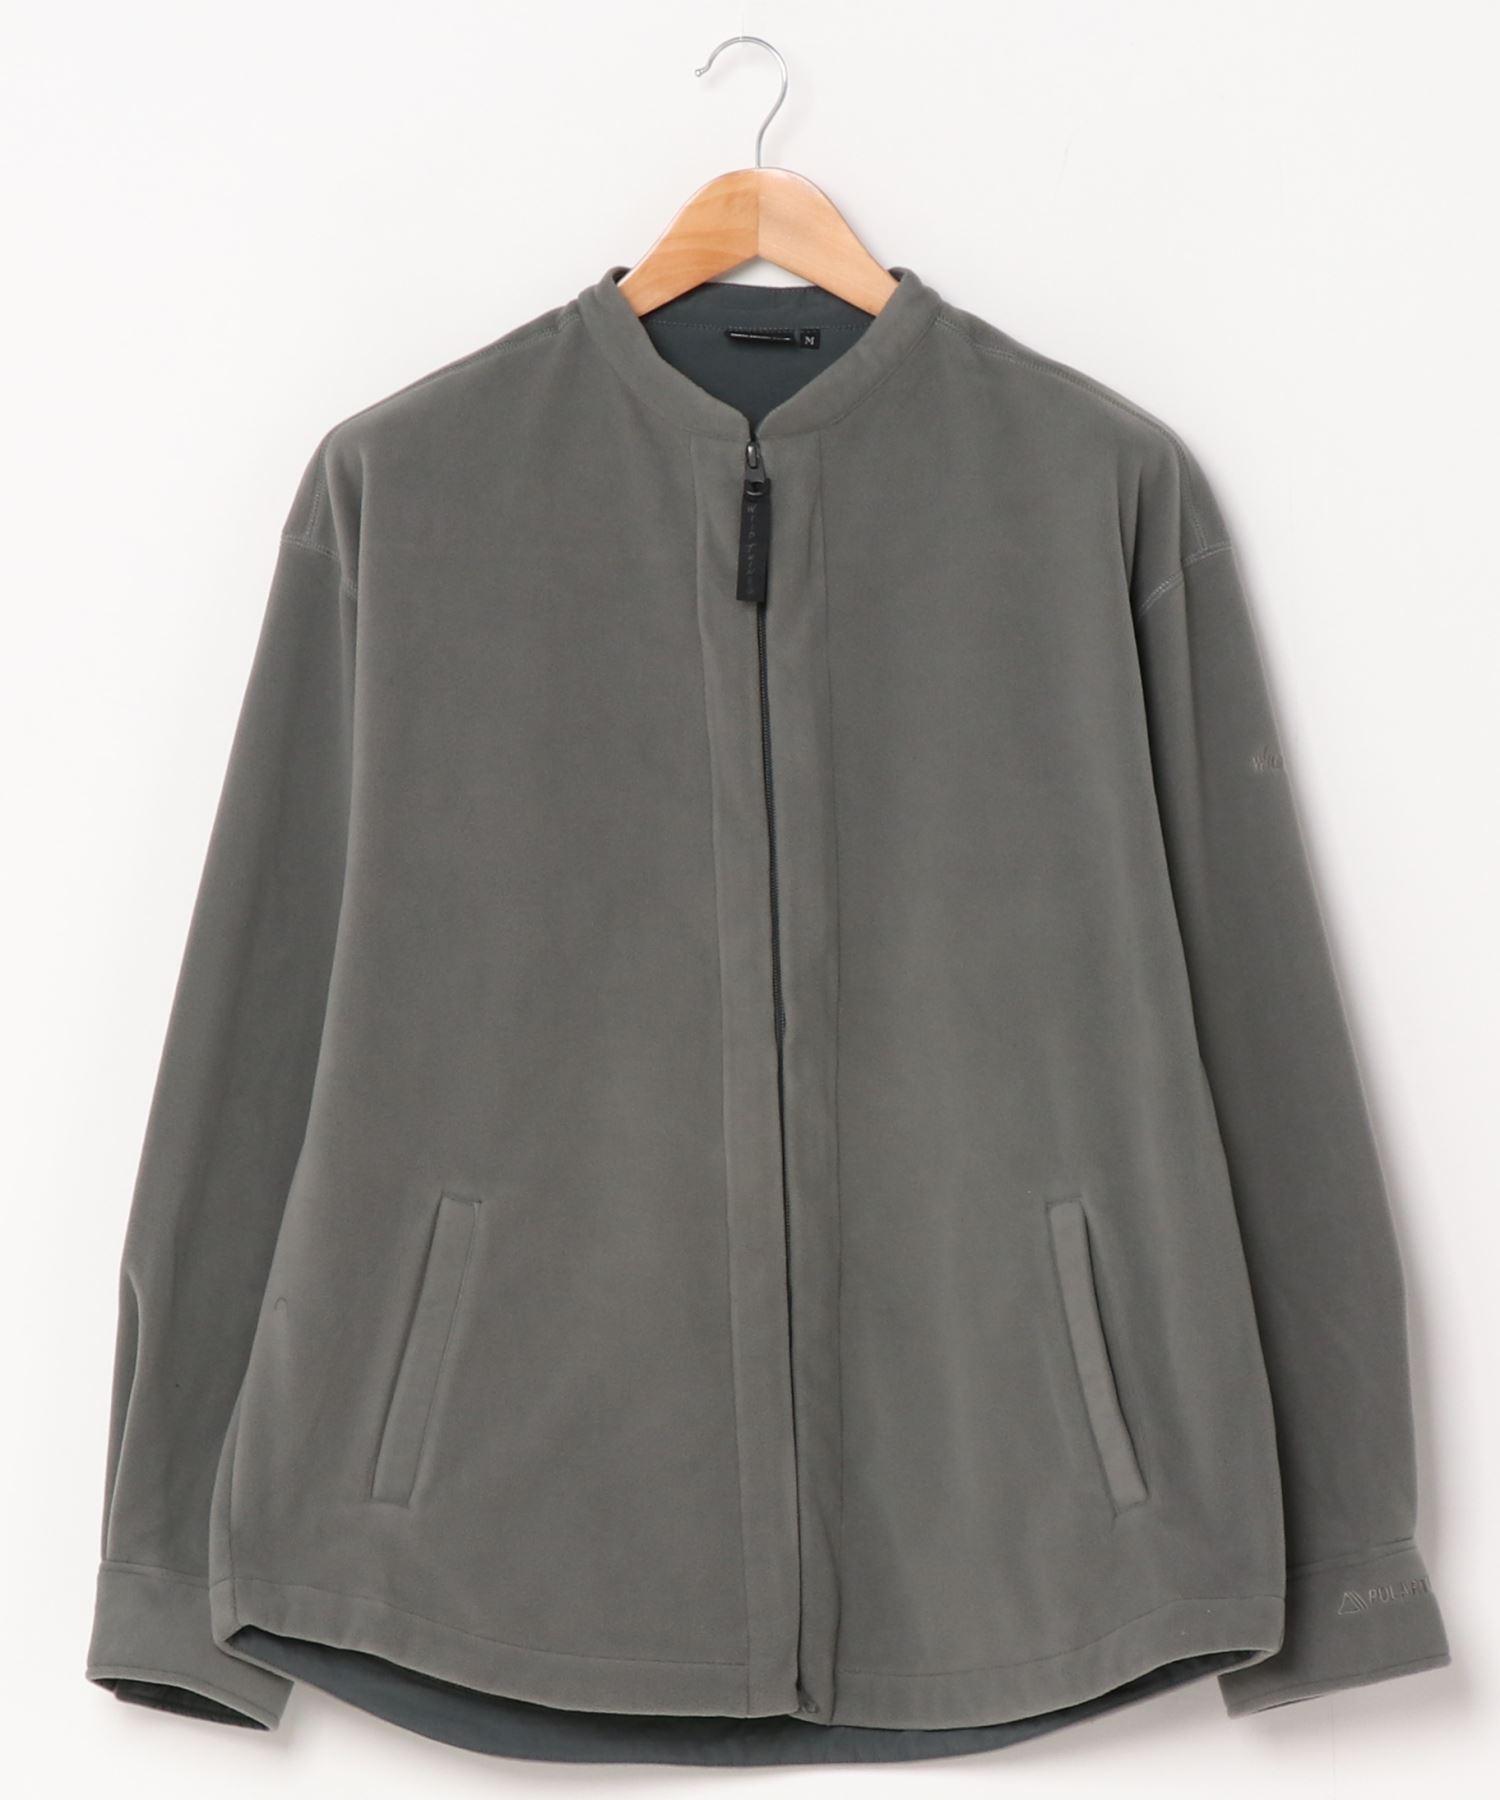 WILDTHINGS / ワイルドシングス ポーラテックバンドカラーシャツ POLERTEC BAND COLLAR SHIRT WT21138N